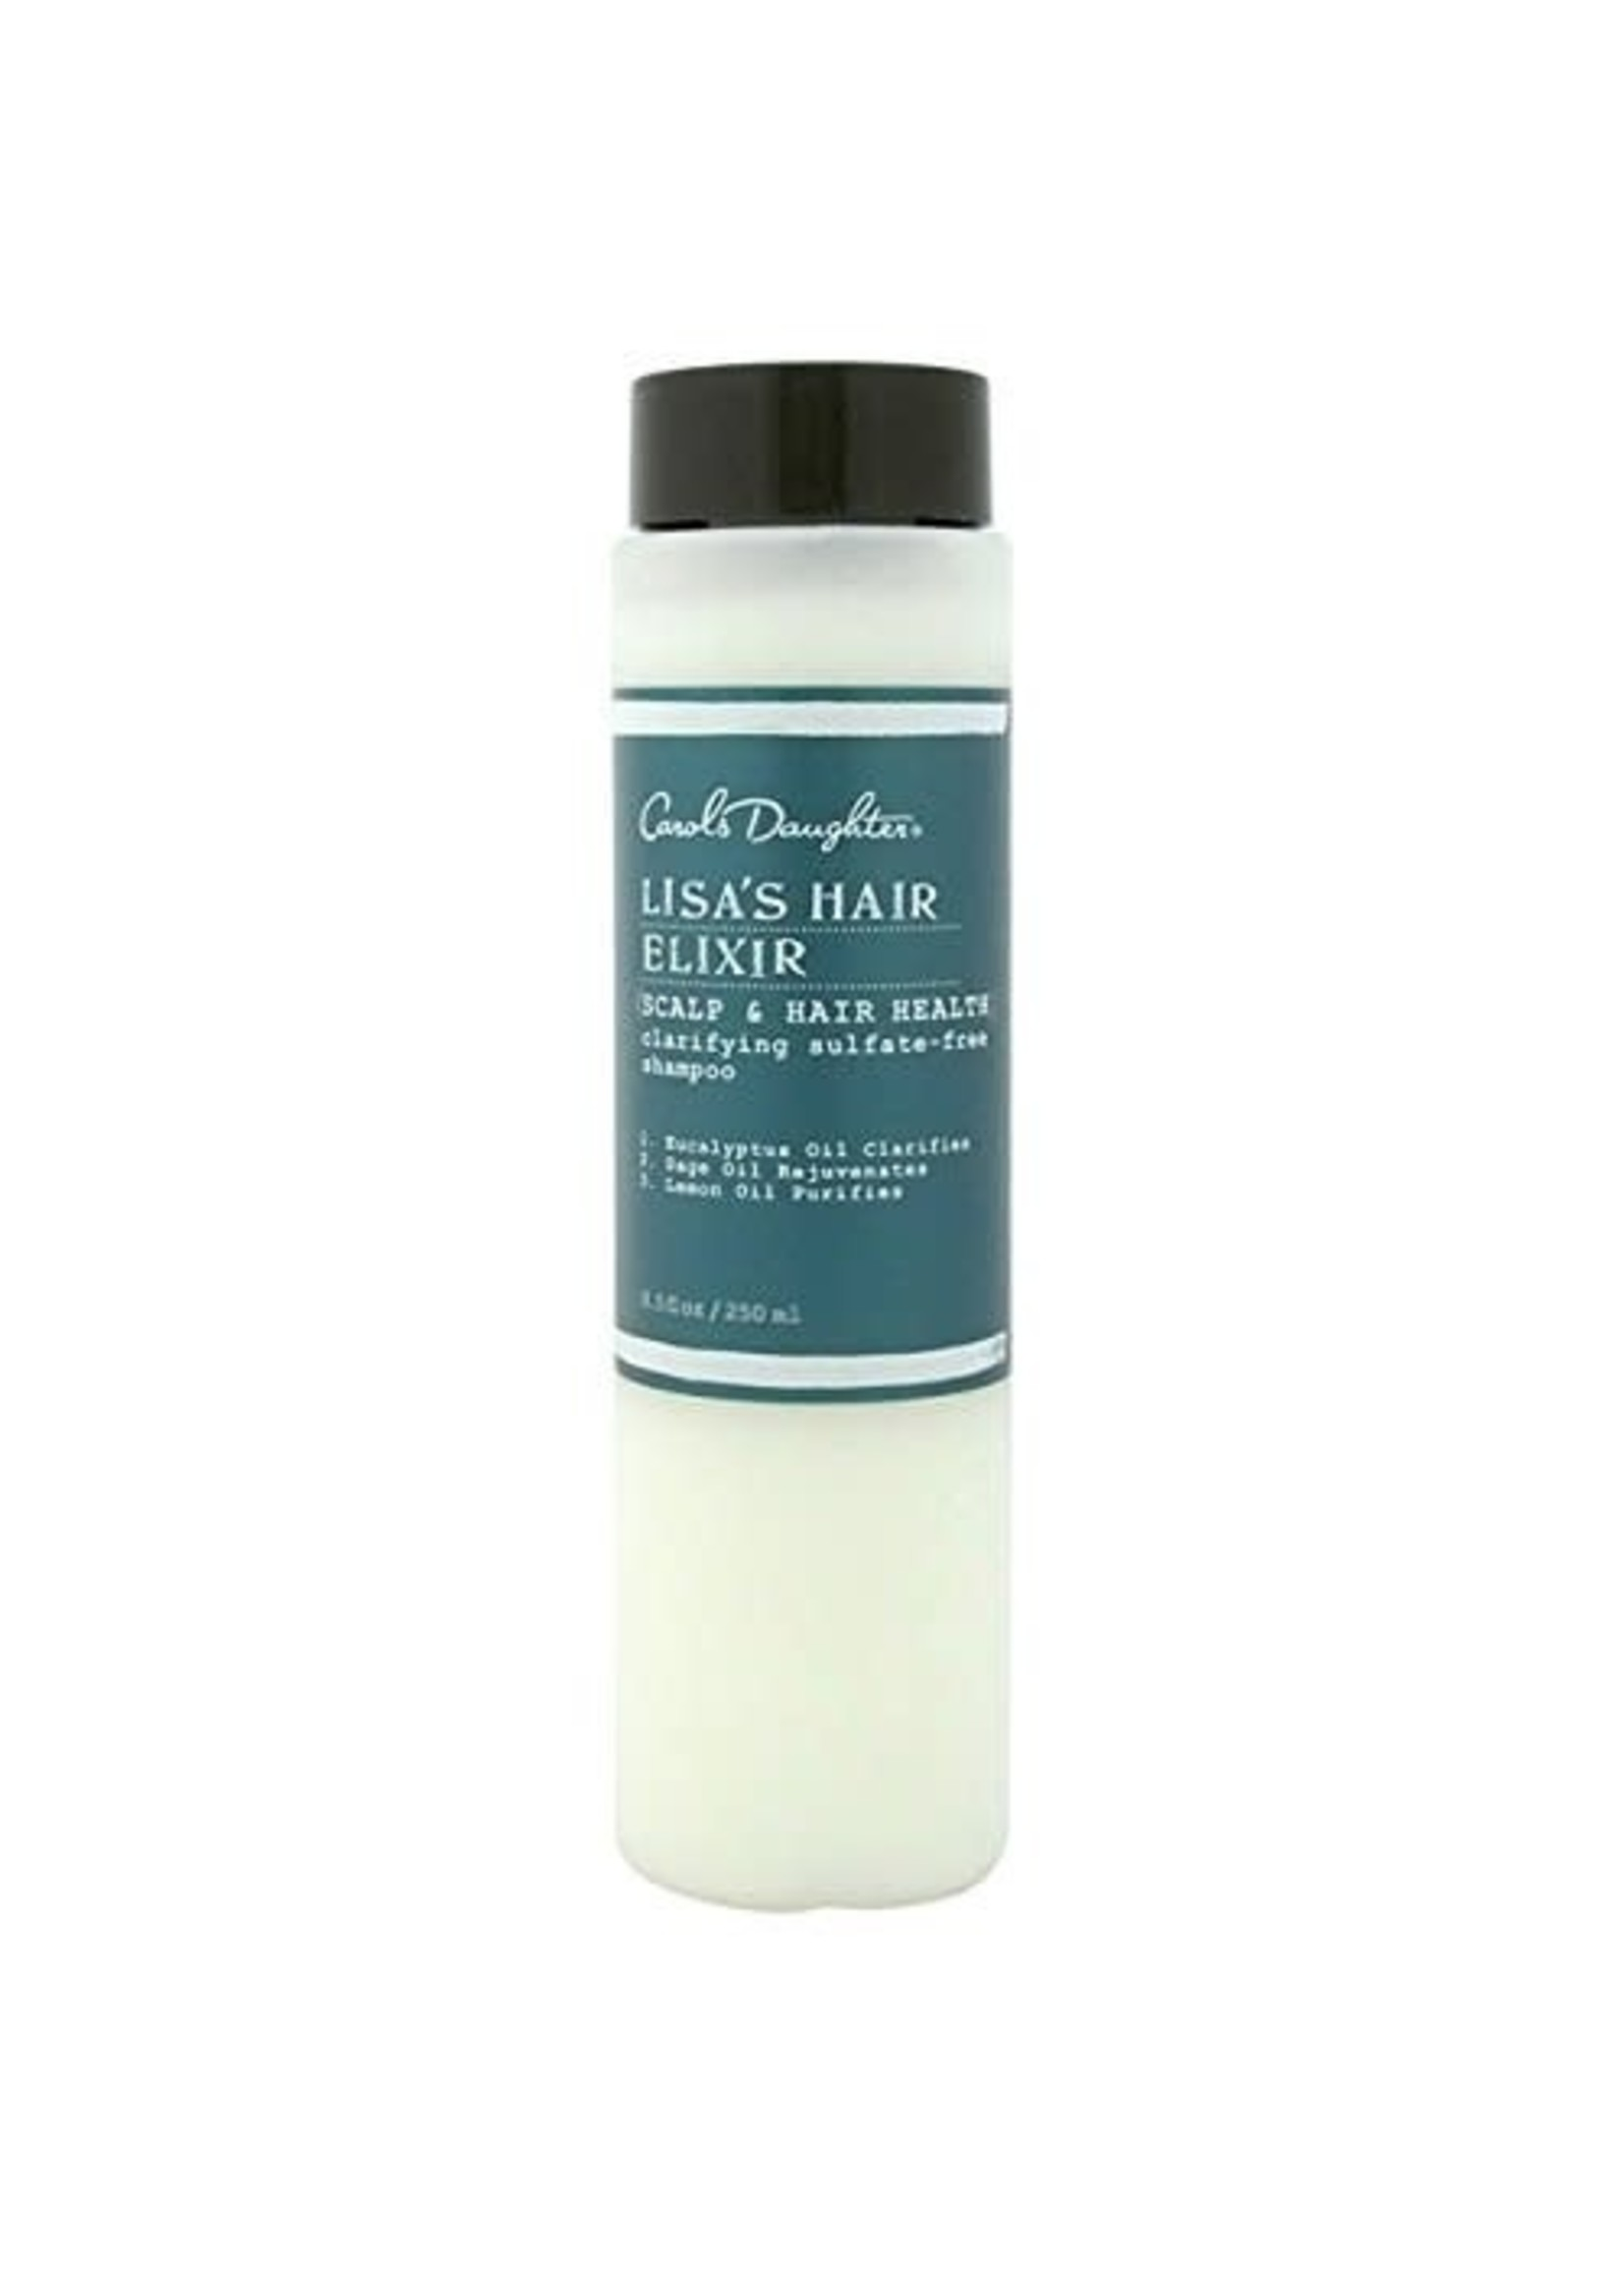 Carol's Daughter Lisas Hair Elixir Clarifying Shampoo